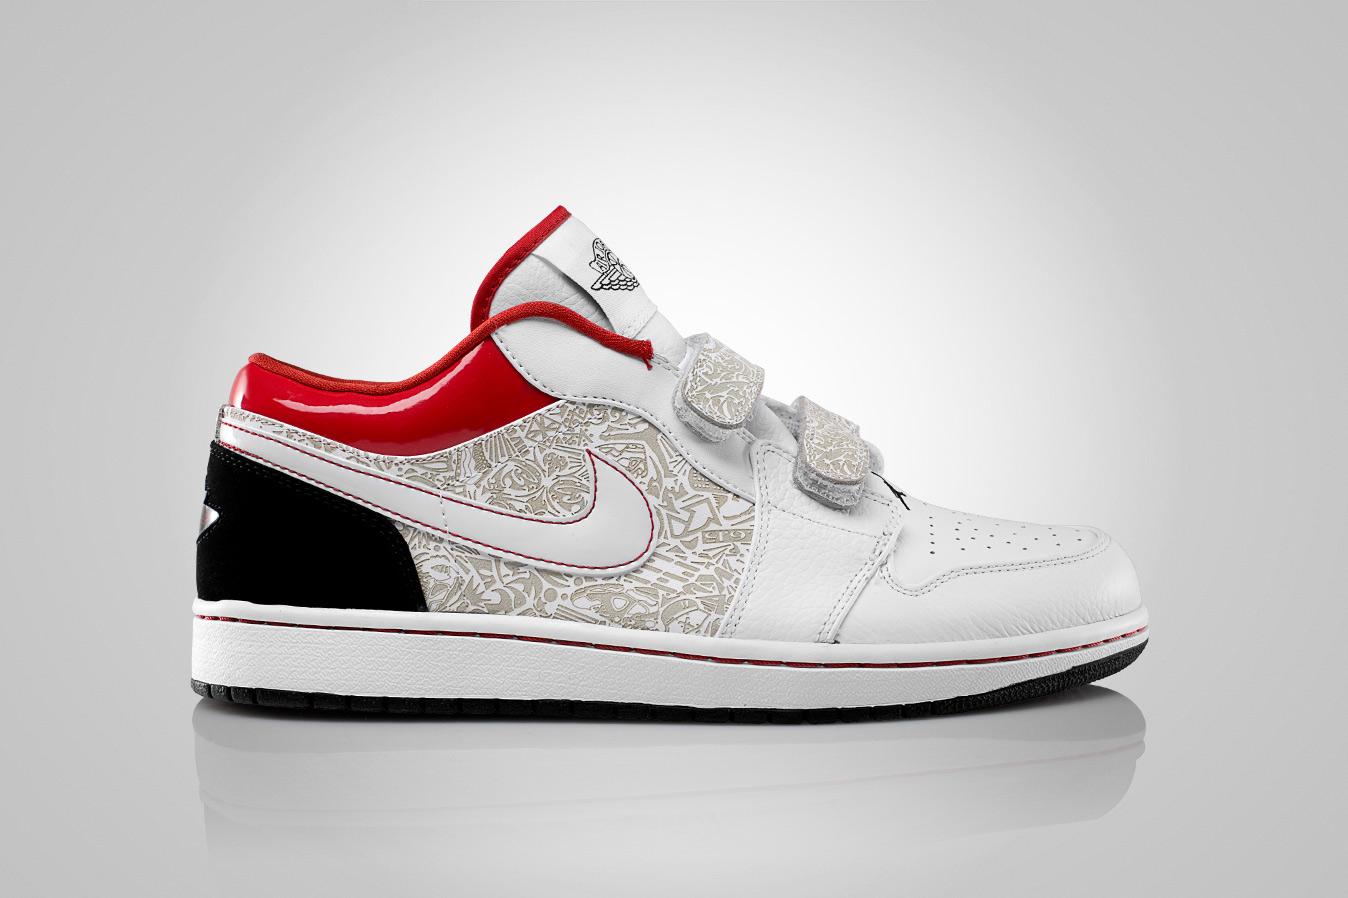 b3ecf4982611 Air Jordan 1 Low Velcro